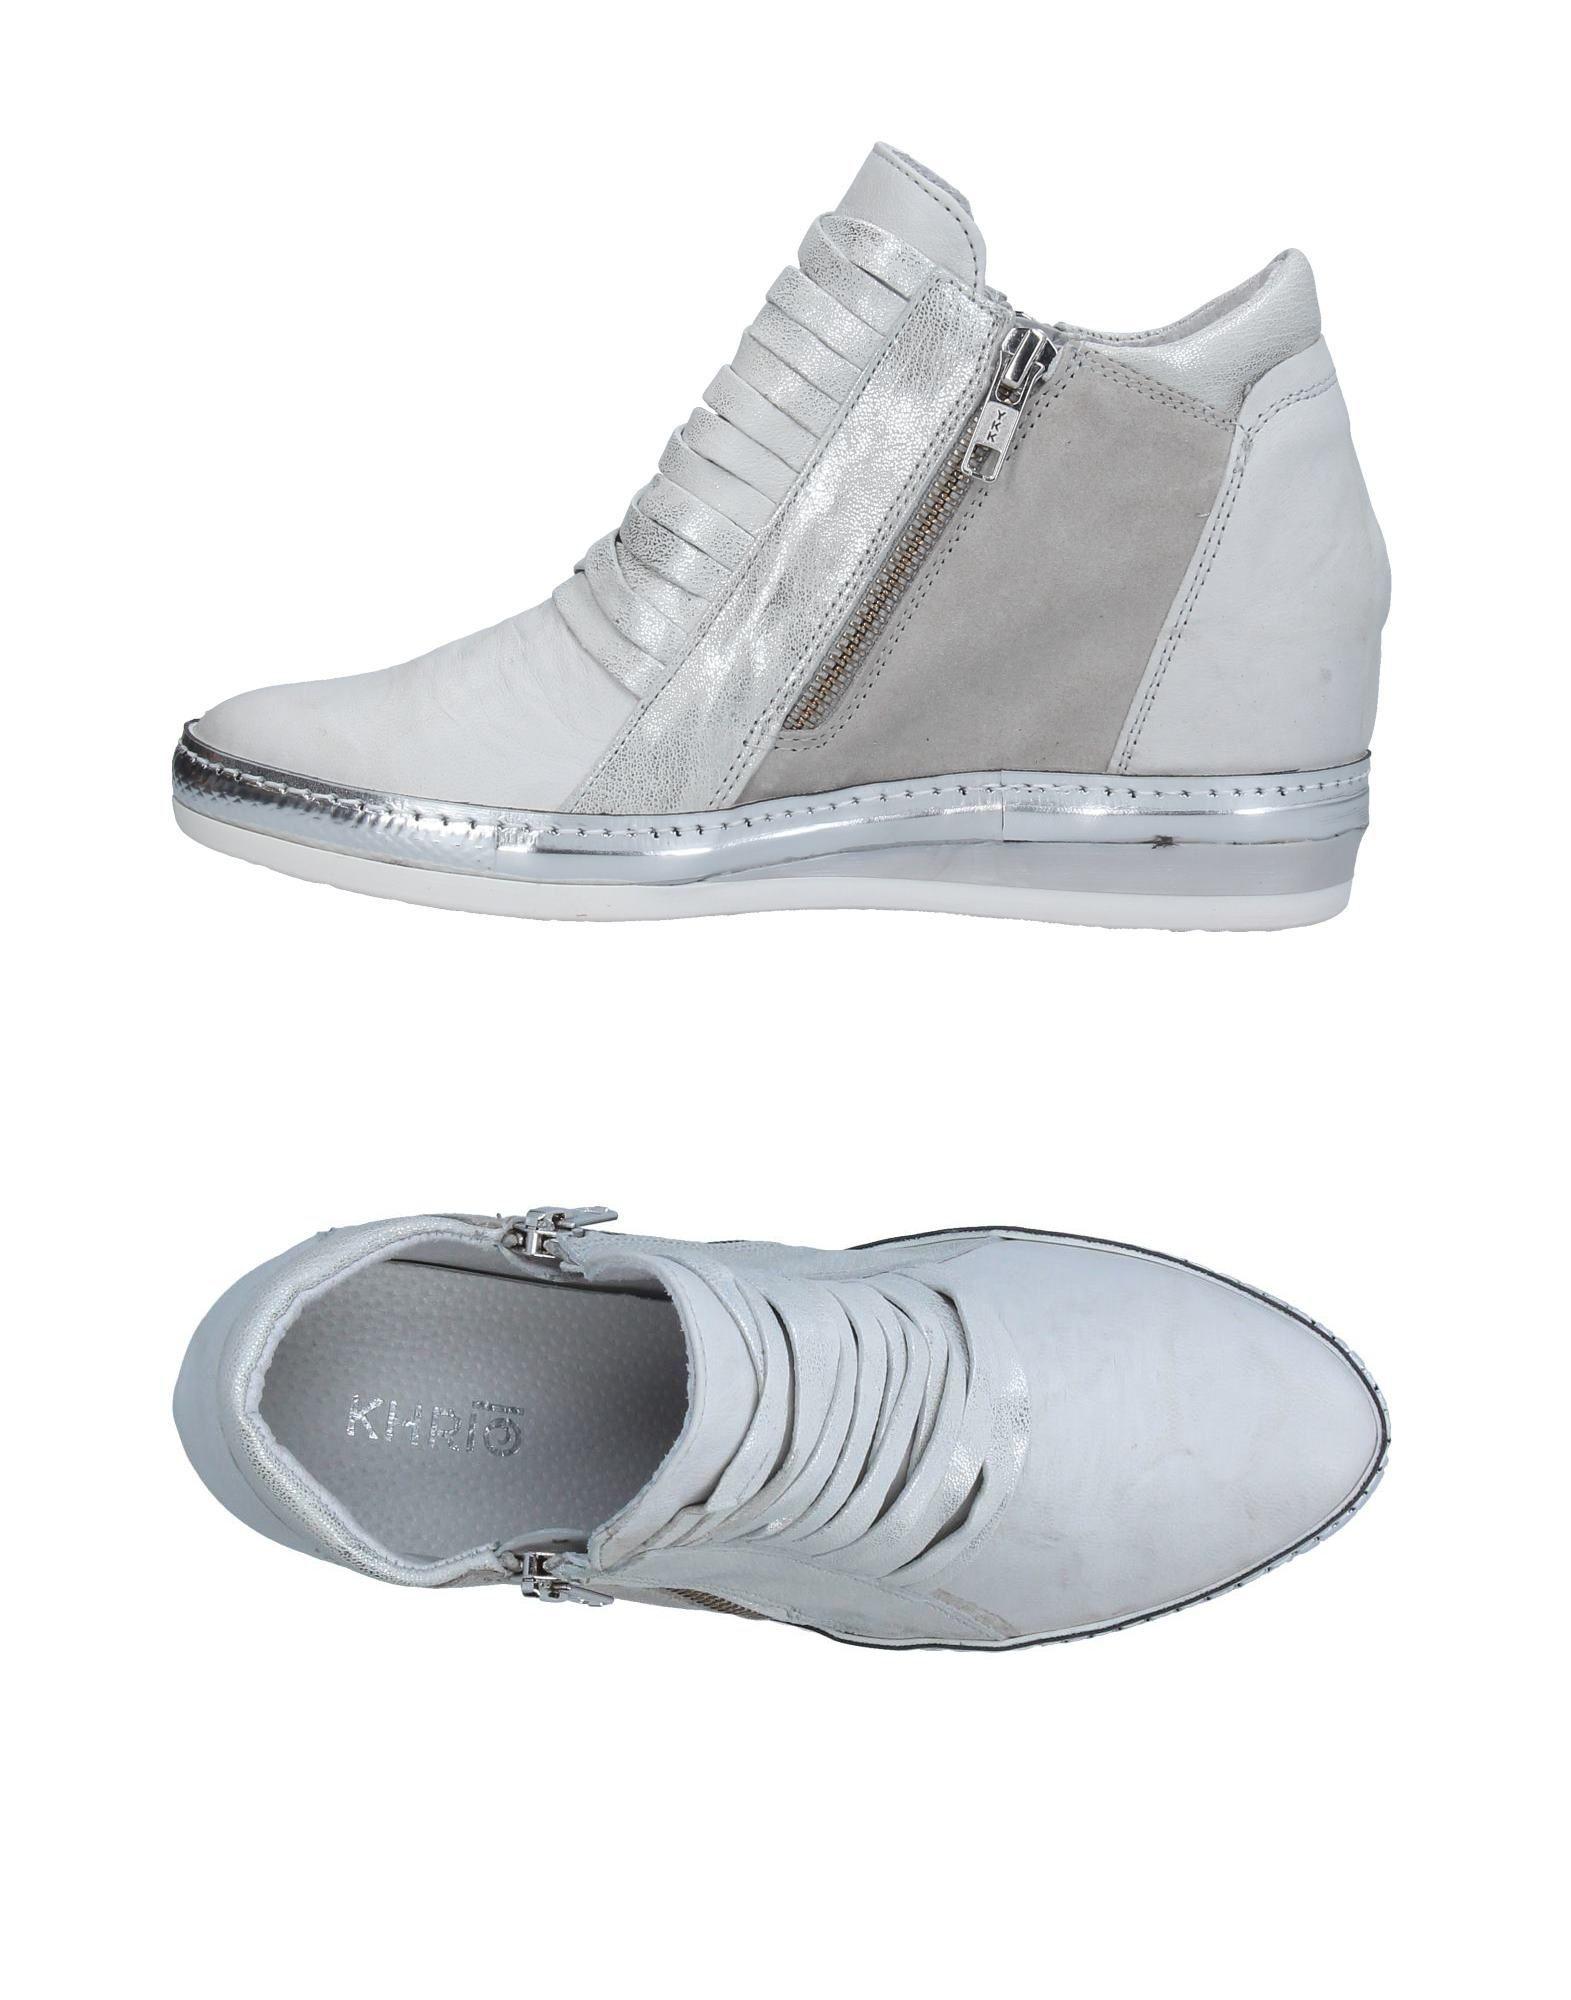 KHRIO' Высокие кеды и кроссовки кеды кроссовки высокие dc council mid tx stone camo